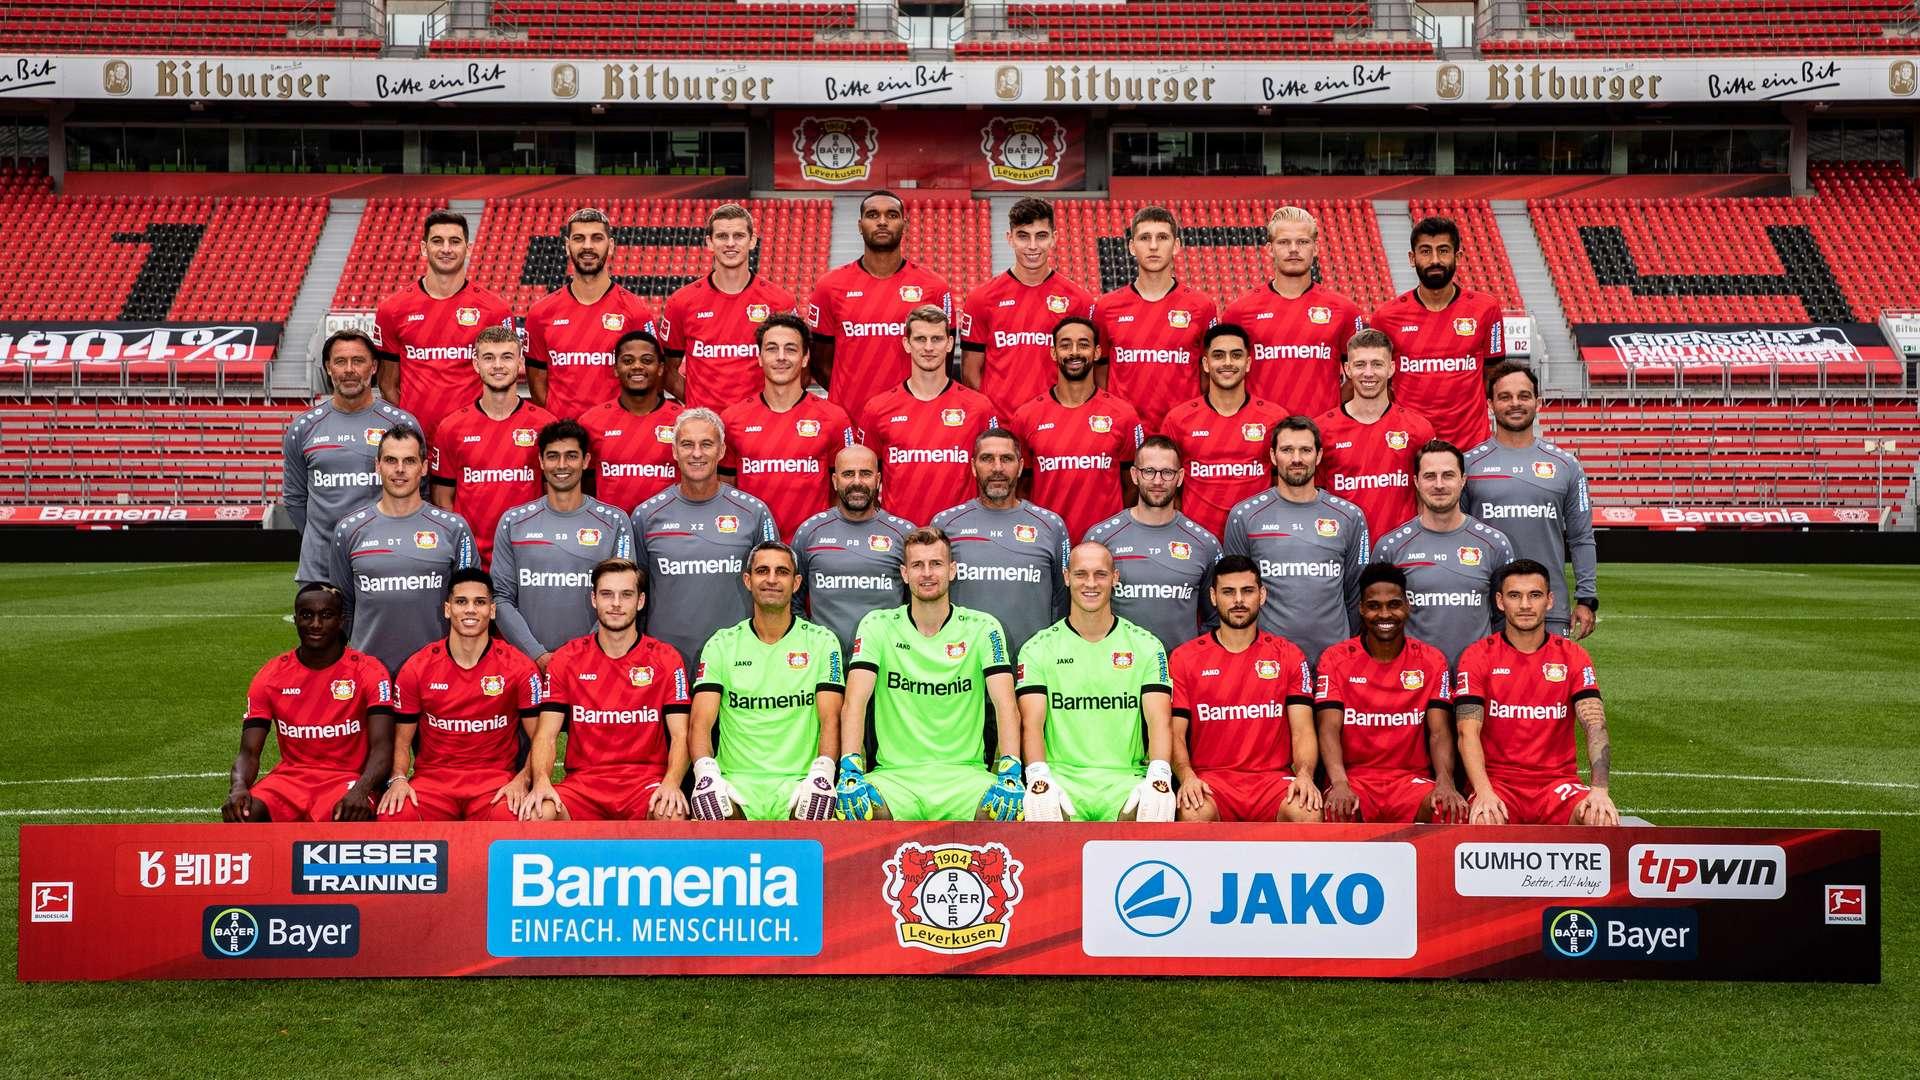 Bayer Leverkusen - history, facts and stats | bet-bet.net